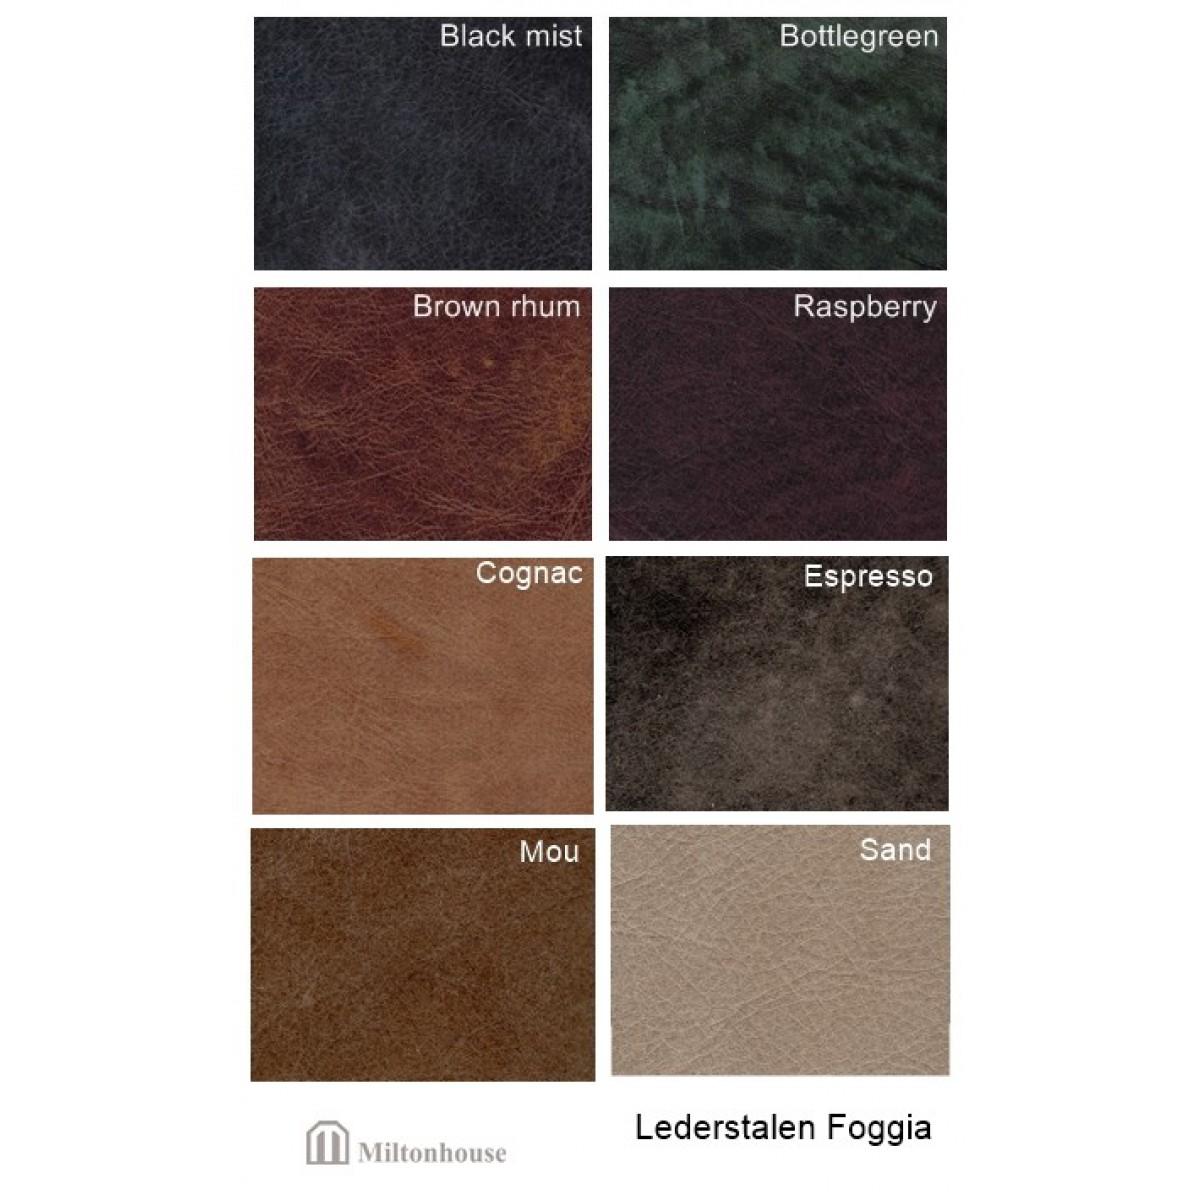 lederstalen-foggia-leder-het-anker-l'ancora-collections-anker-miltonhouse